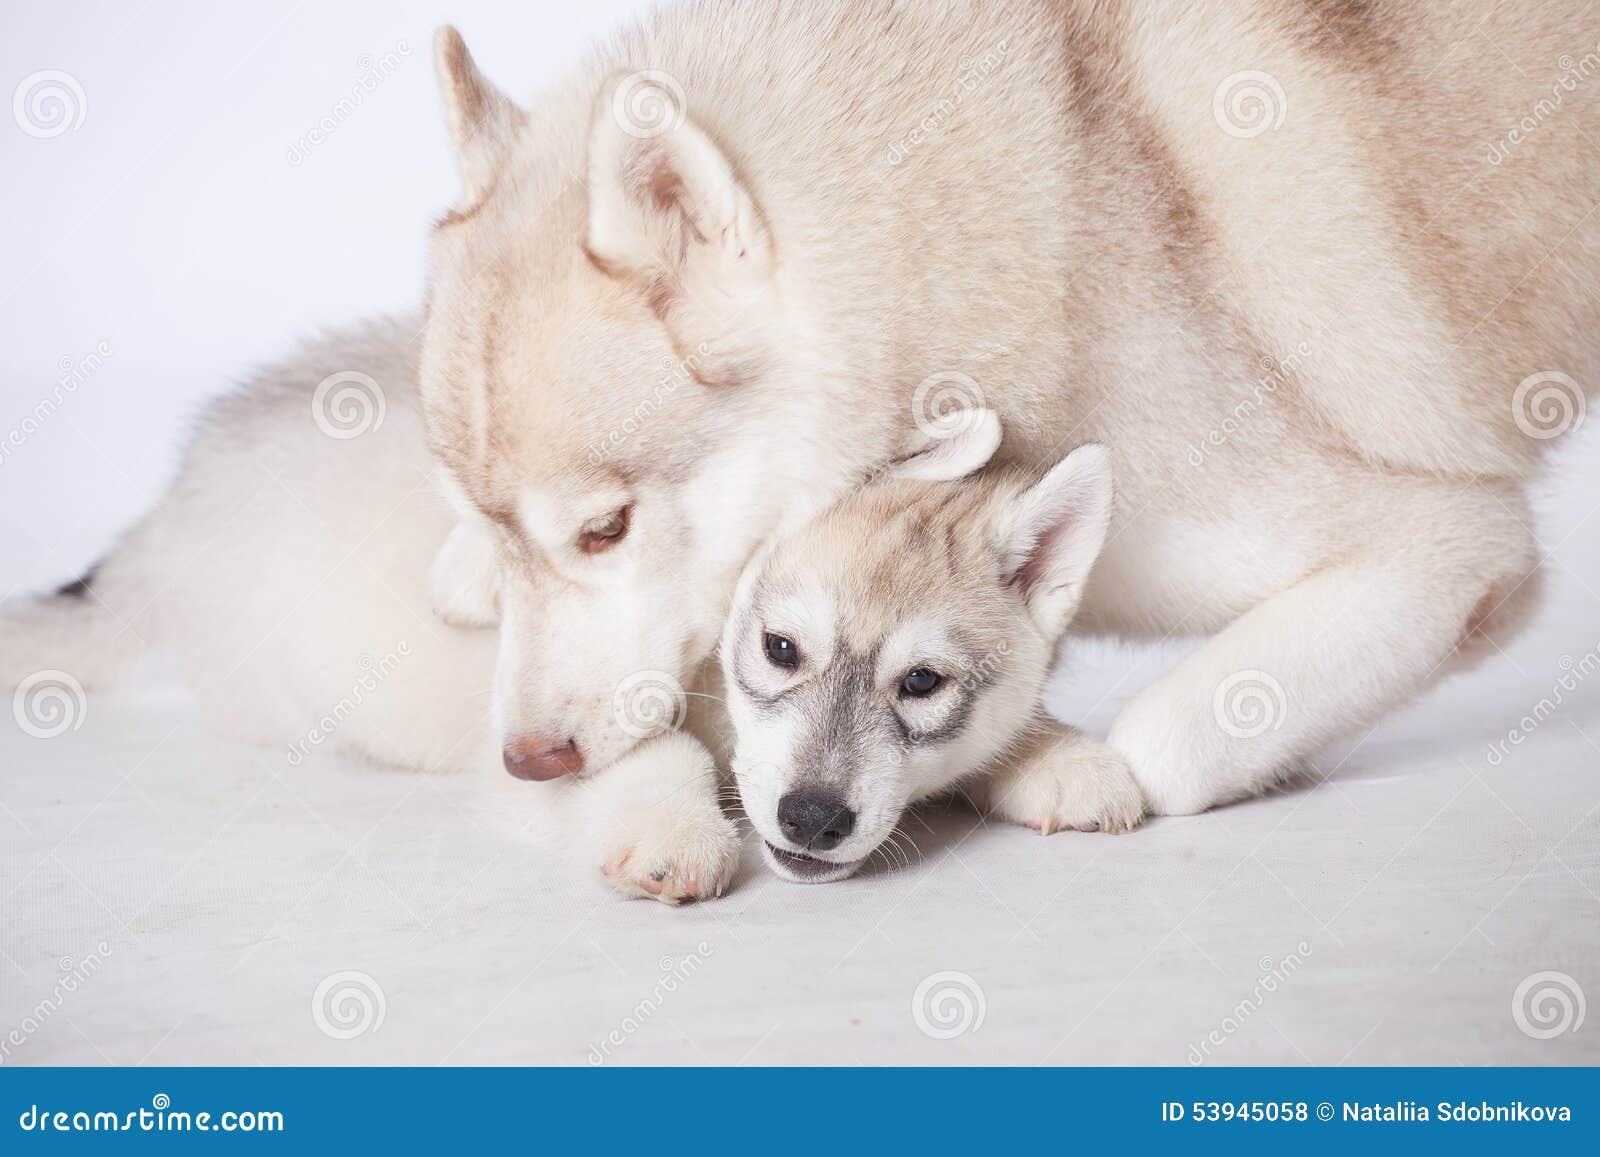 Siberian Husky Dogs Stock Photo Image 53945058